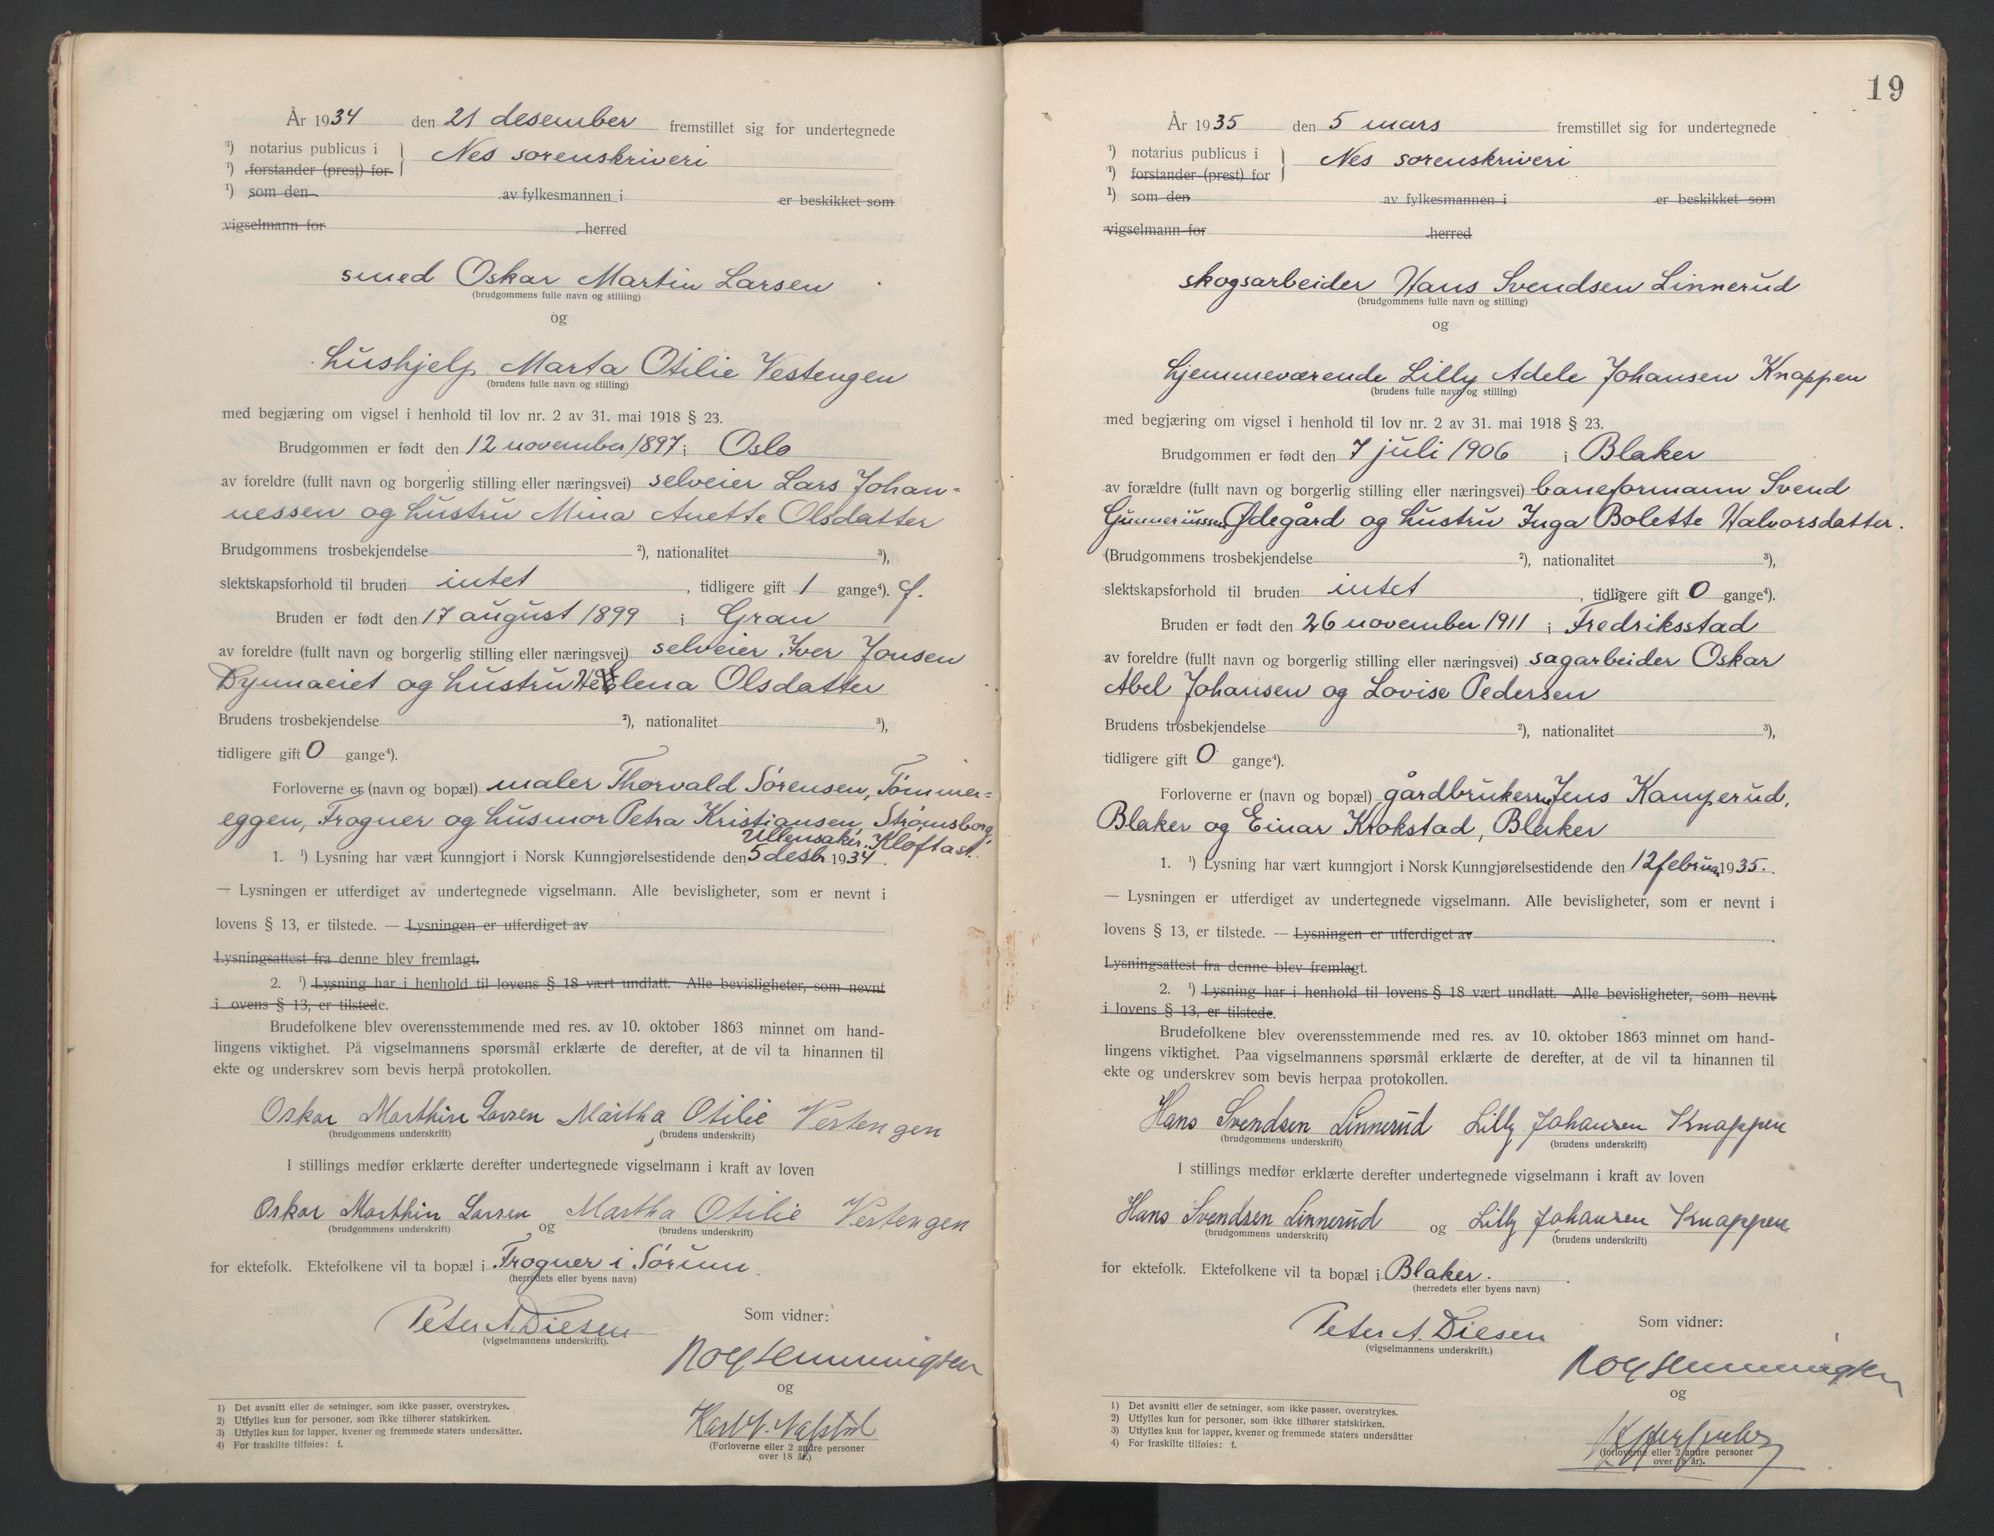 SAO, Nes tingrett, L/Lc/Lca/L0001: Vigselbok, 1920-1943, s. 19